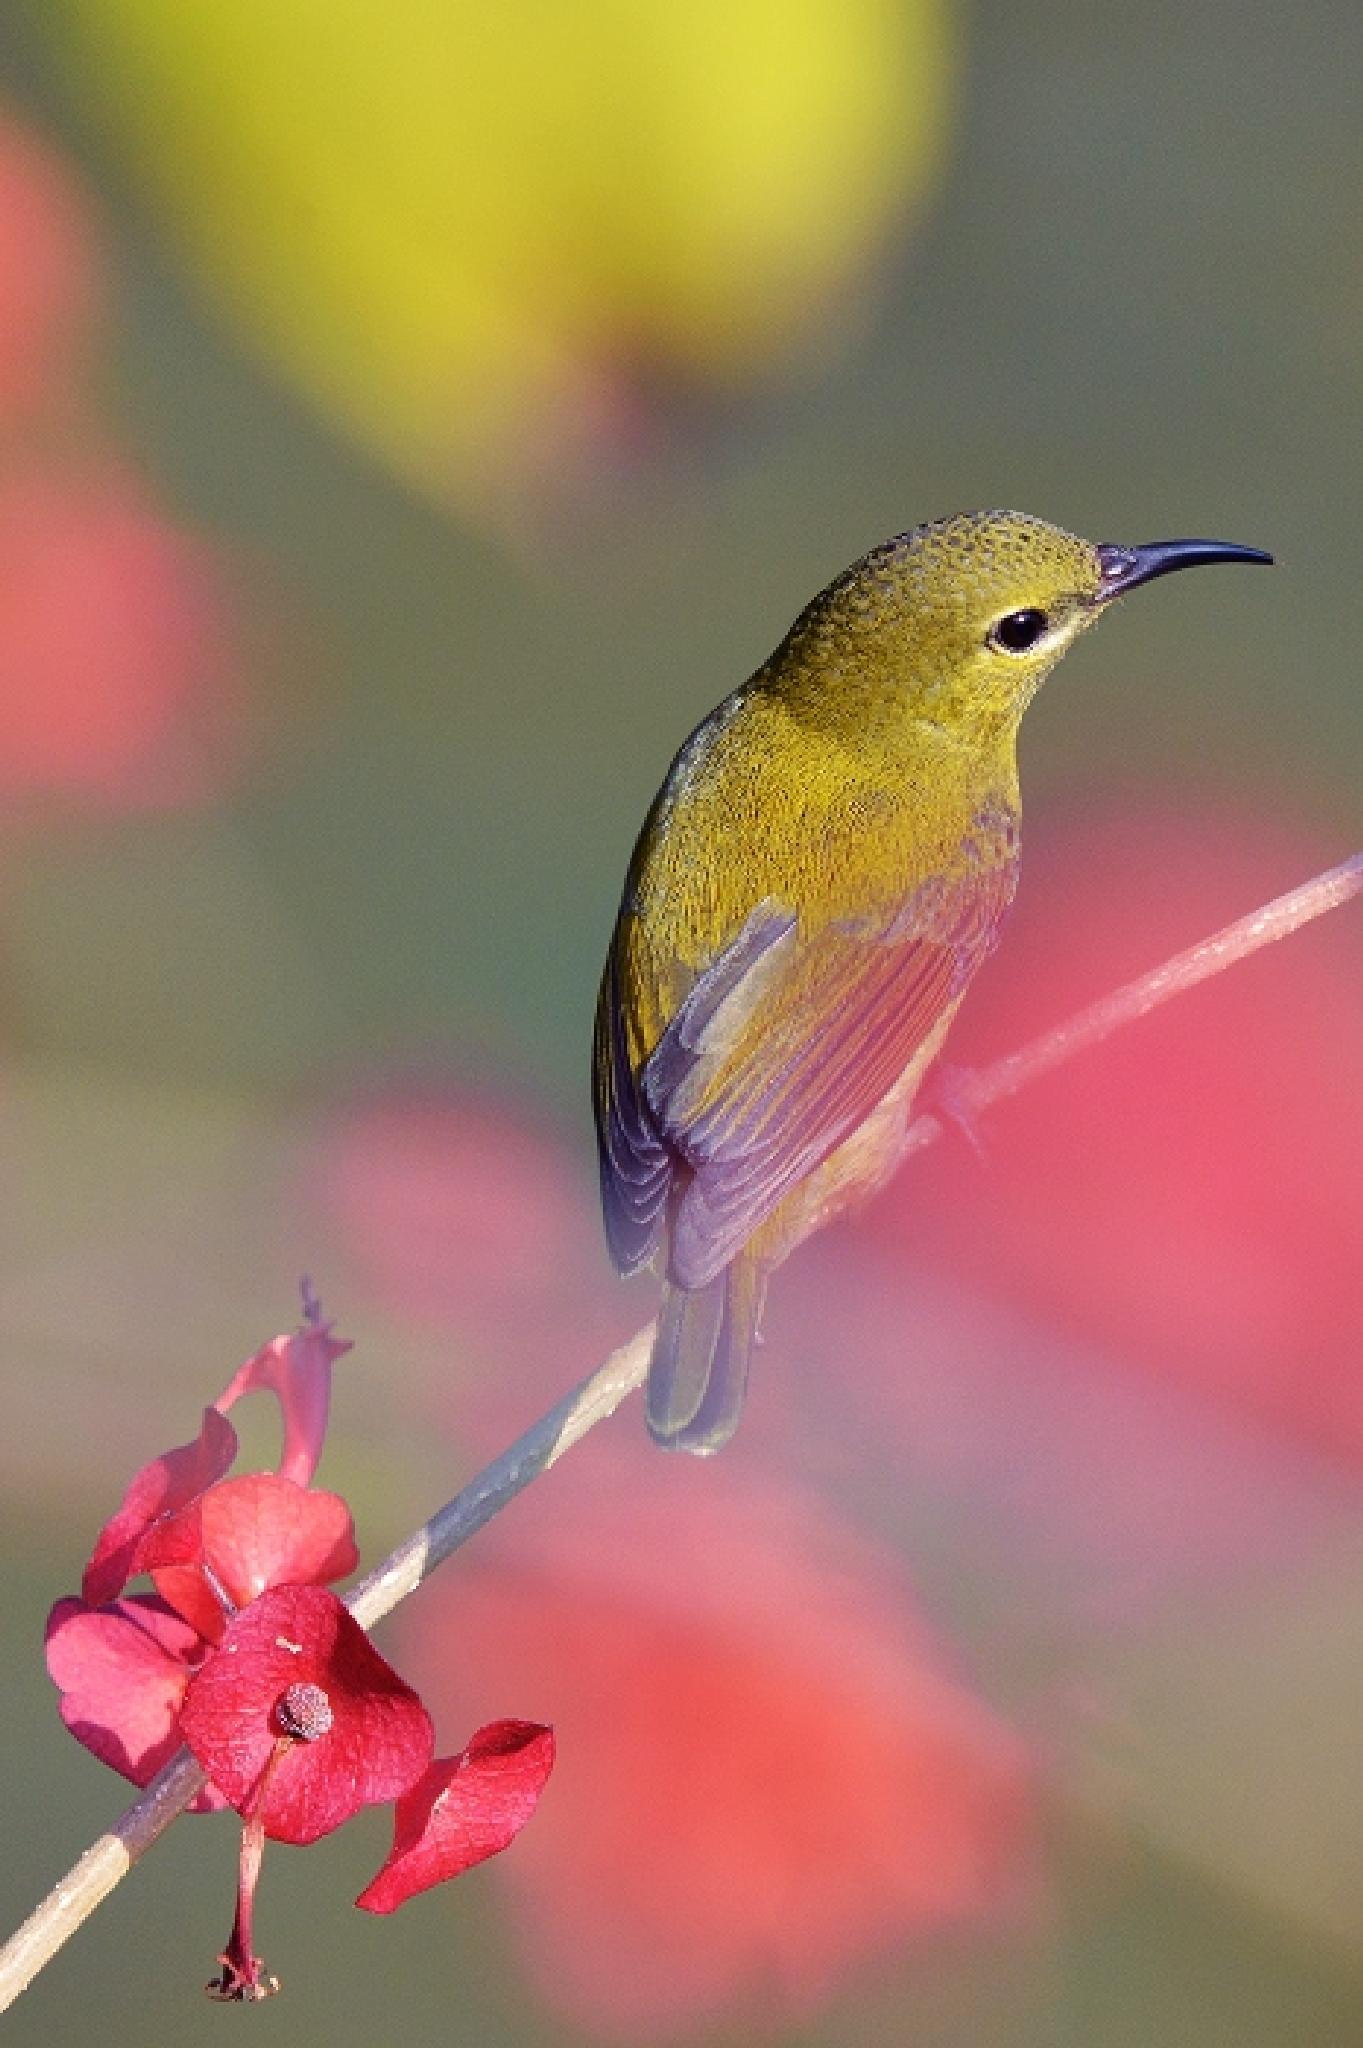 Fork-tailed Sunbird by colonelnikon